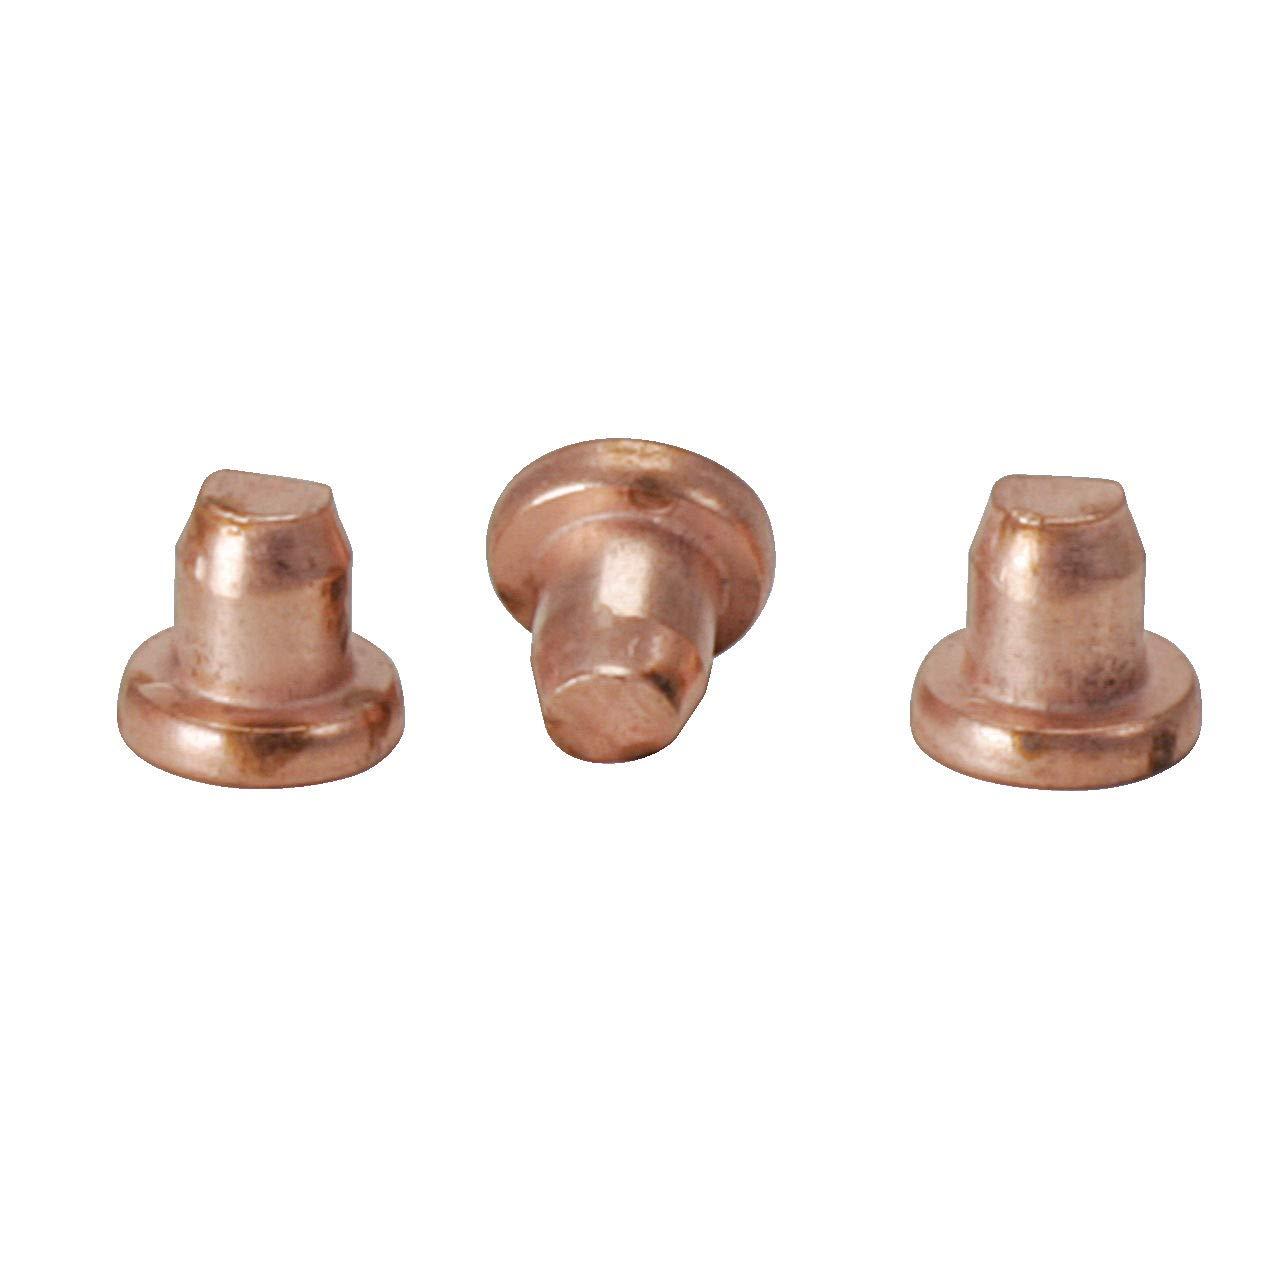 KS Tools 500.8576 Rivets 5.0 x 8.2 mm copper coated 100-pack